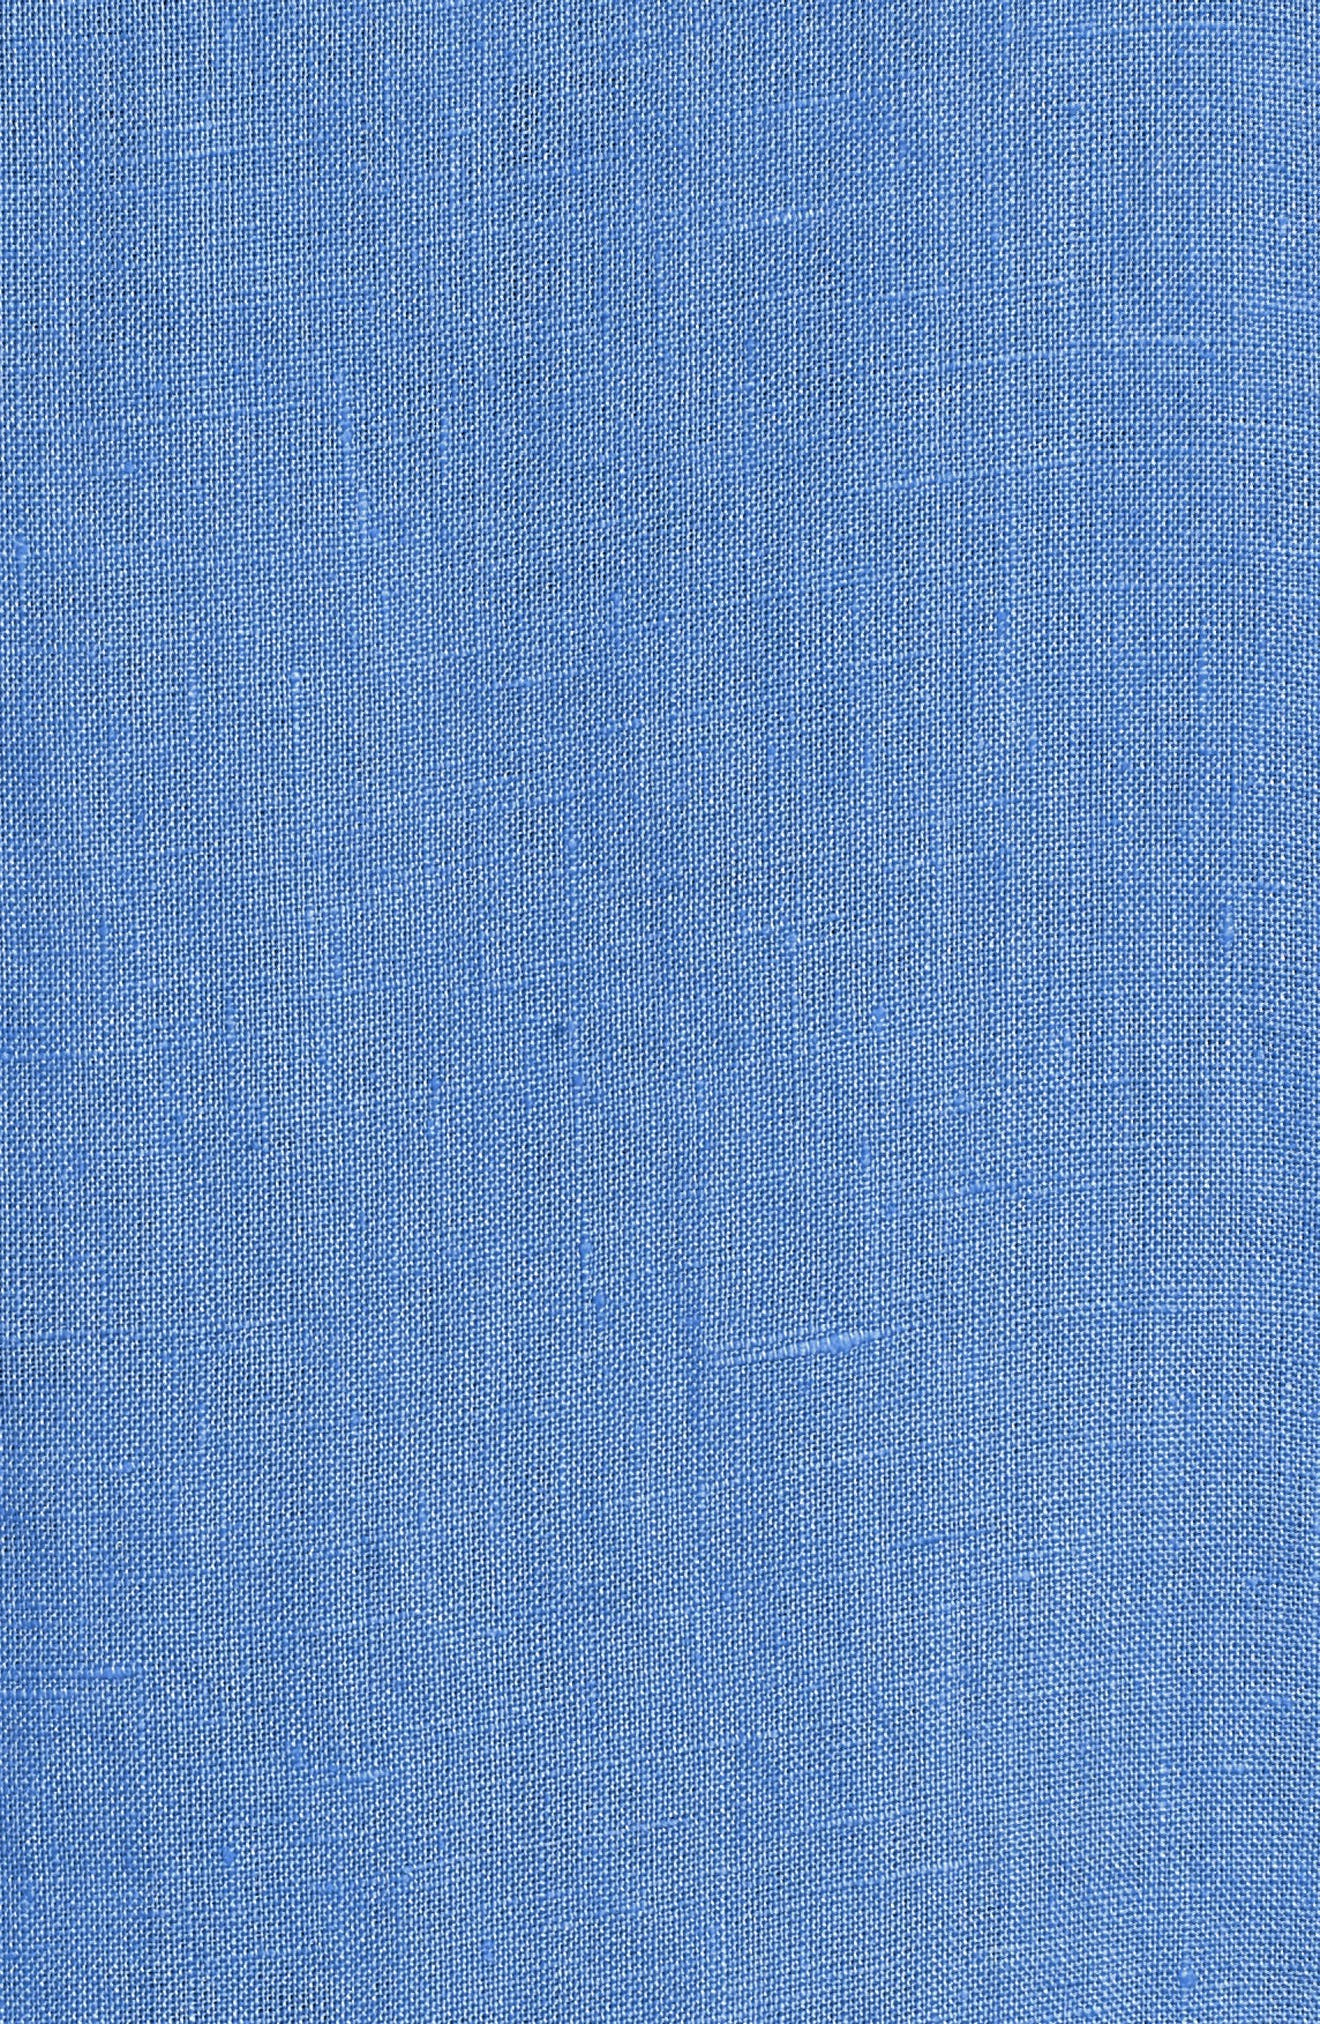 Woven Organic Linen Top,                             Alternate thumbnail 6, color,                             Bluebell